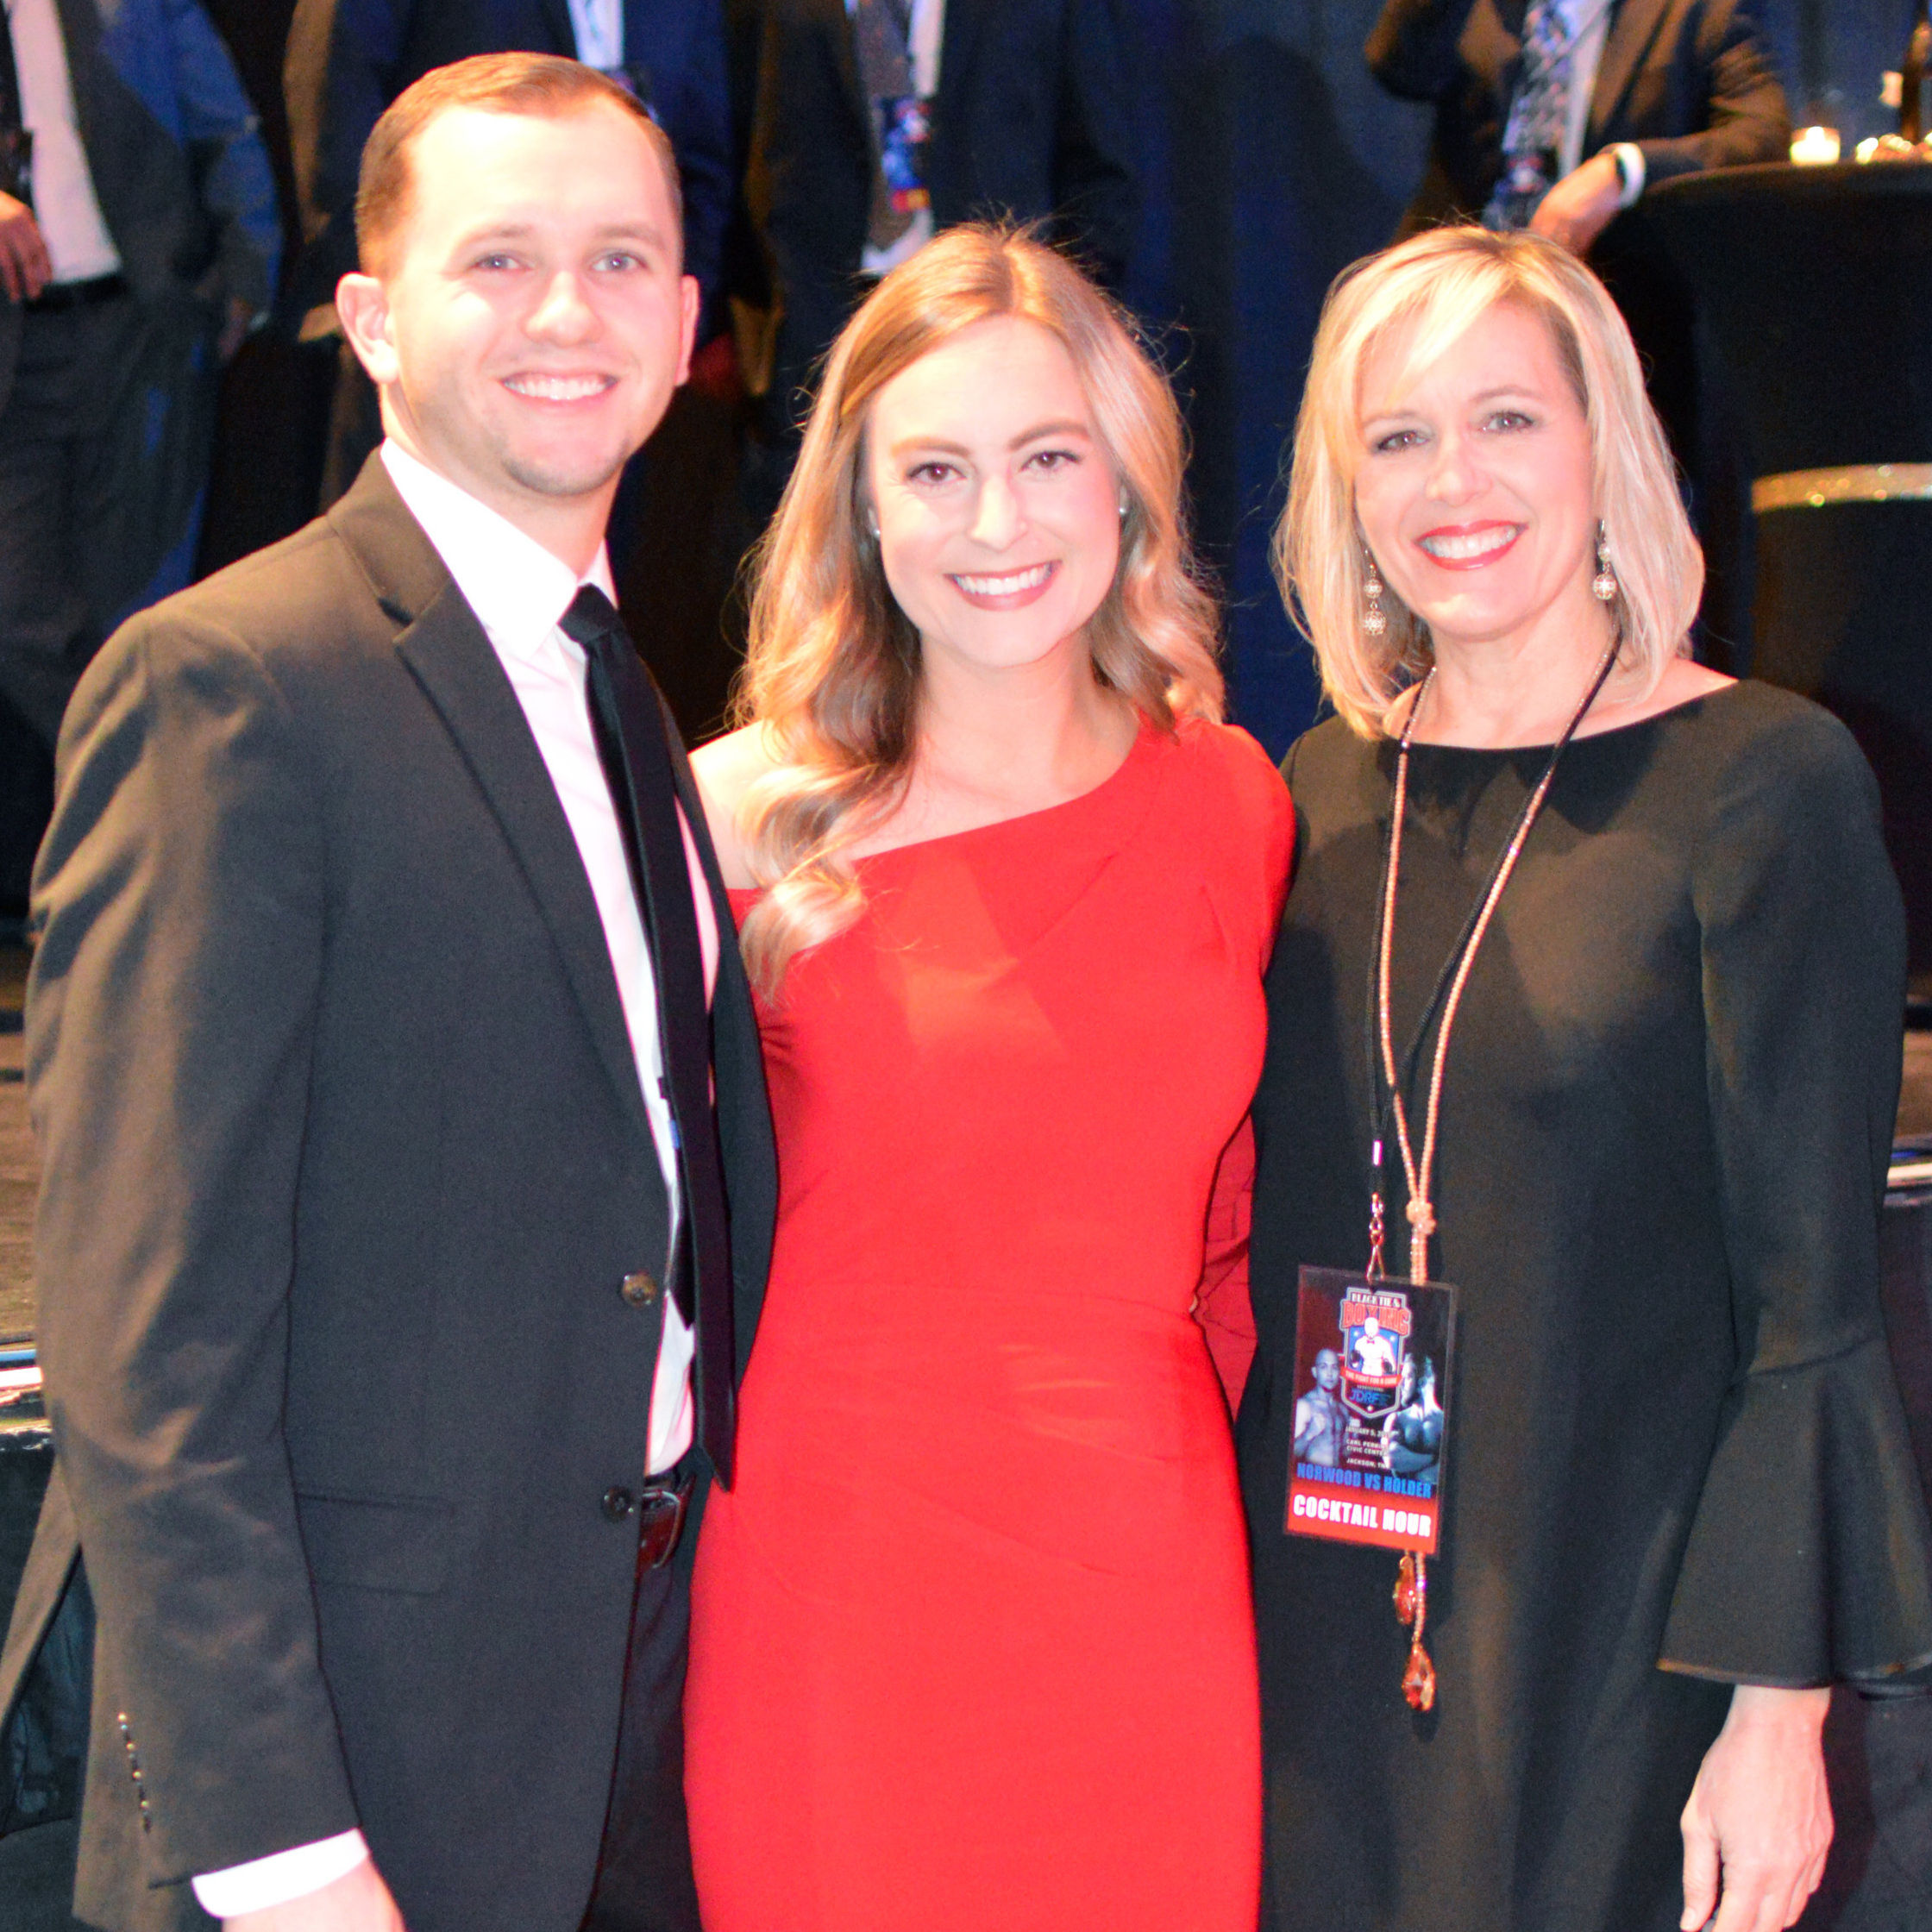 Brady Sheppard, Lauren Sheppard & Kellye Cash Sheppard